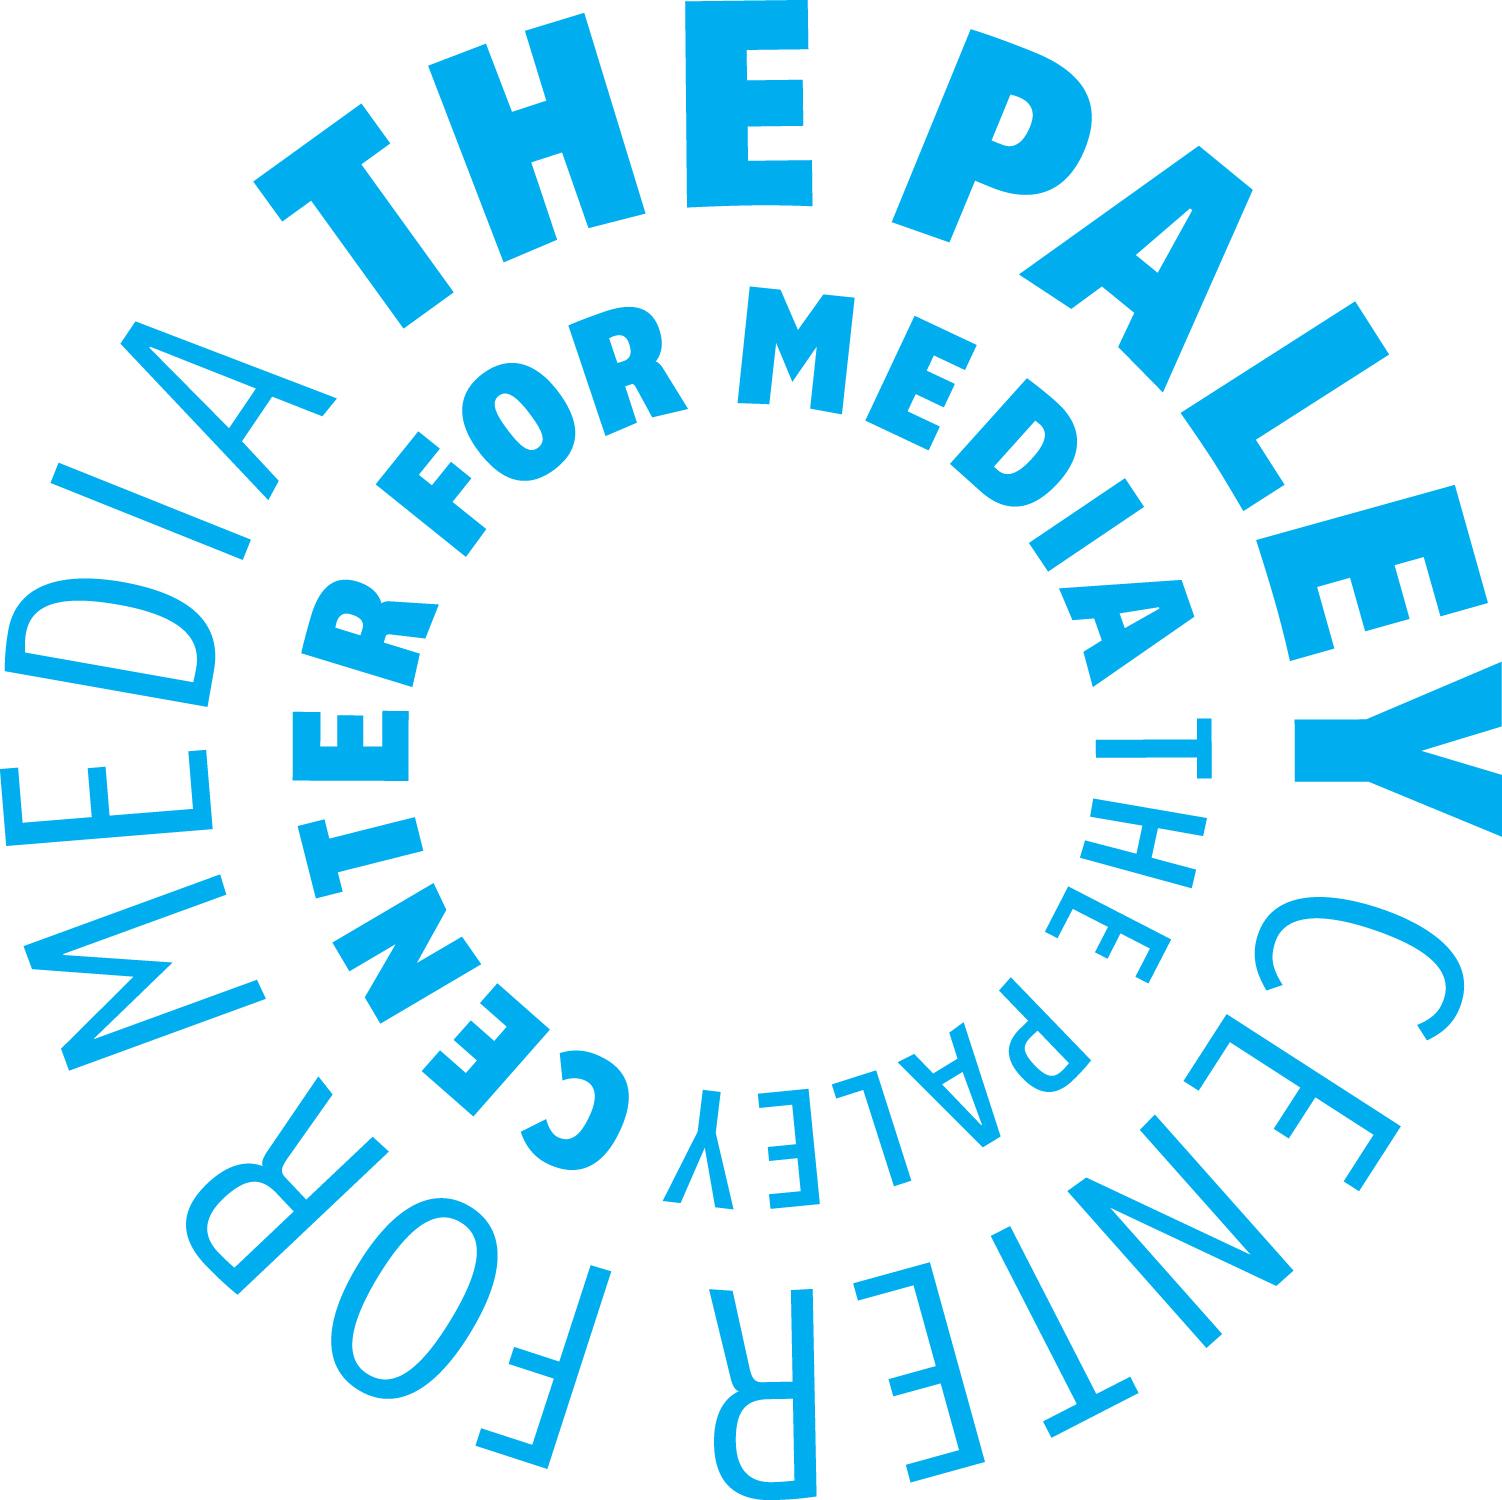 paley_logo__120110195201.jpg